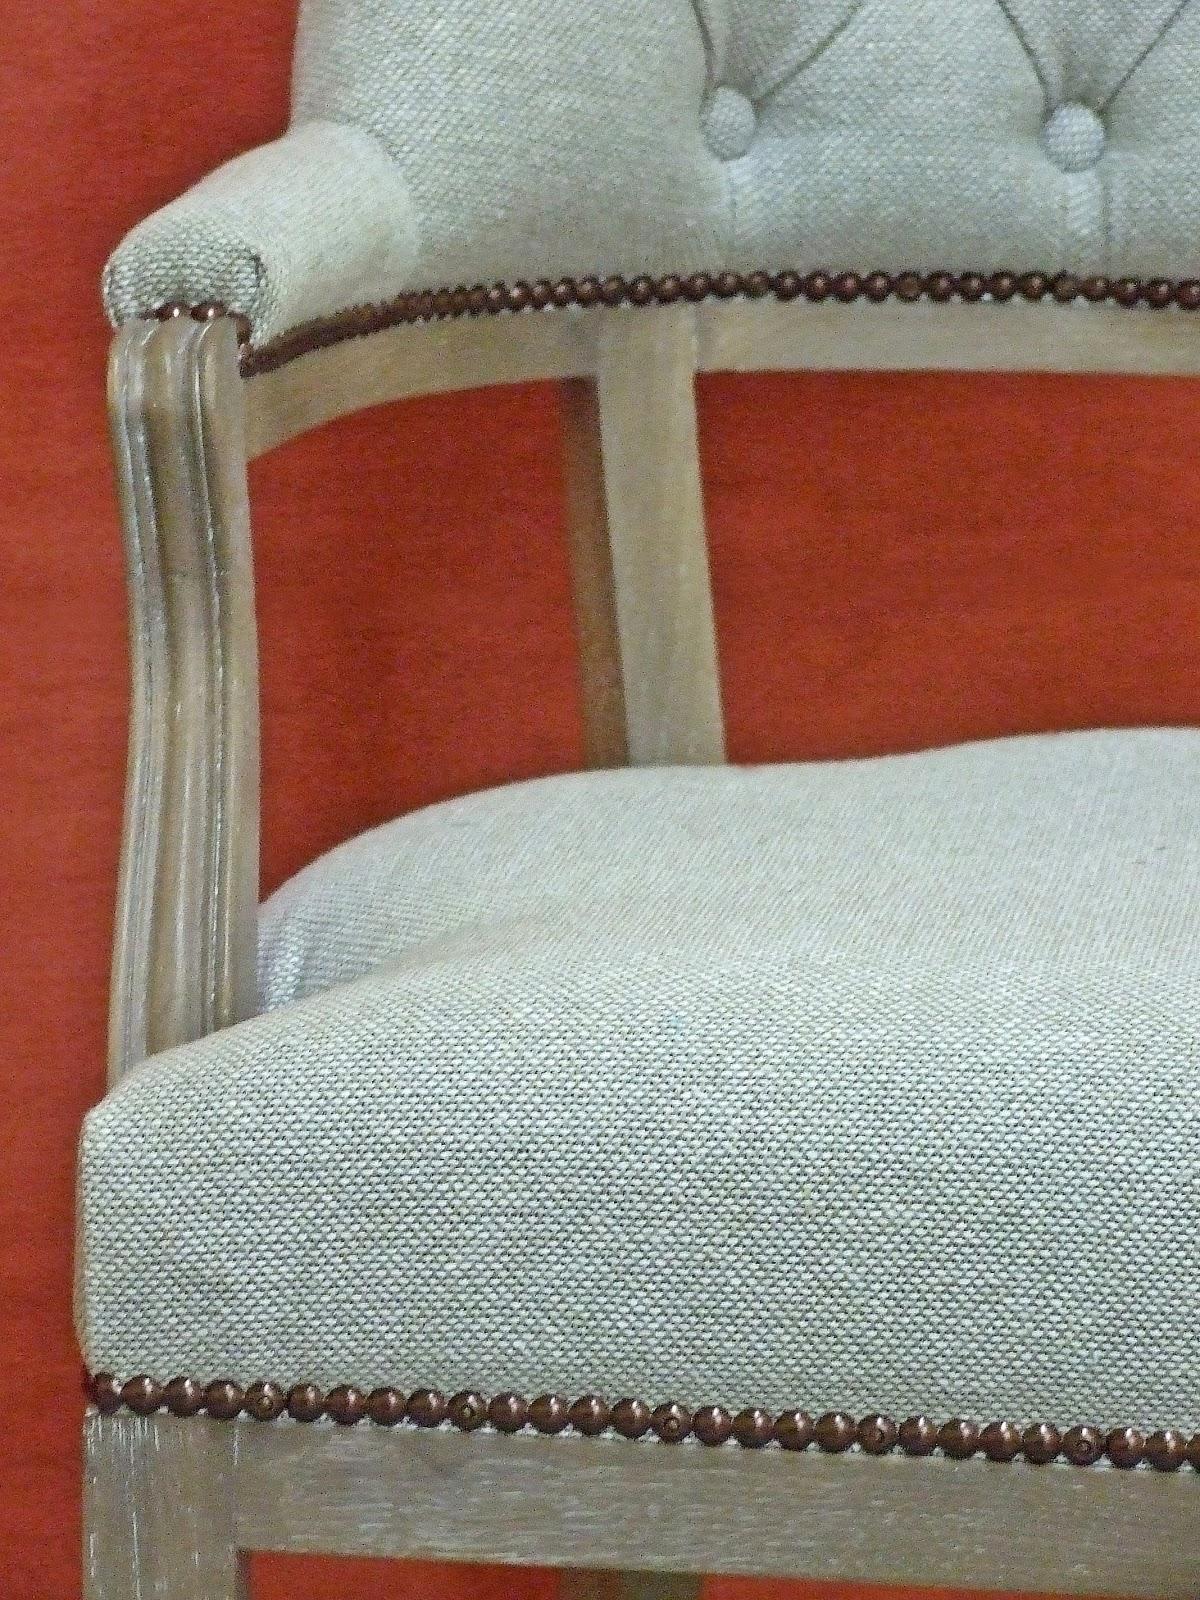 El taller de yoyo antigua silla capiton de correos - Como tapizar sillas antiguas ...